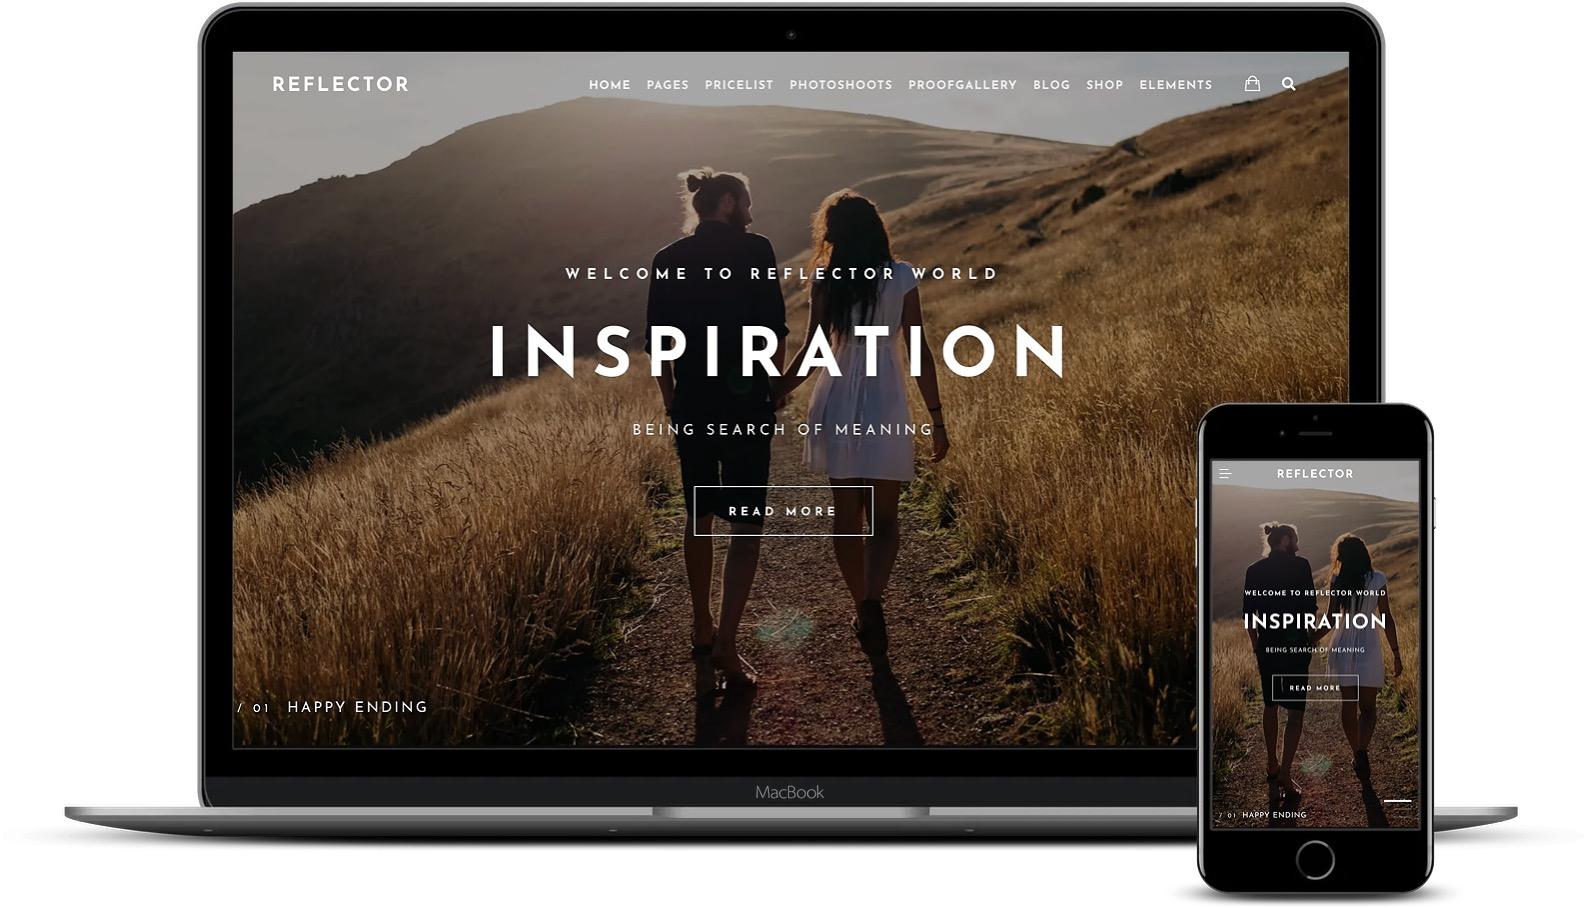 Reflector是摄影师的WordPress主题